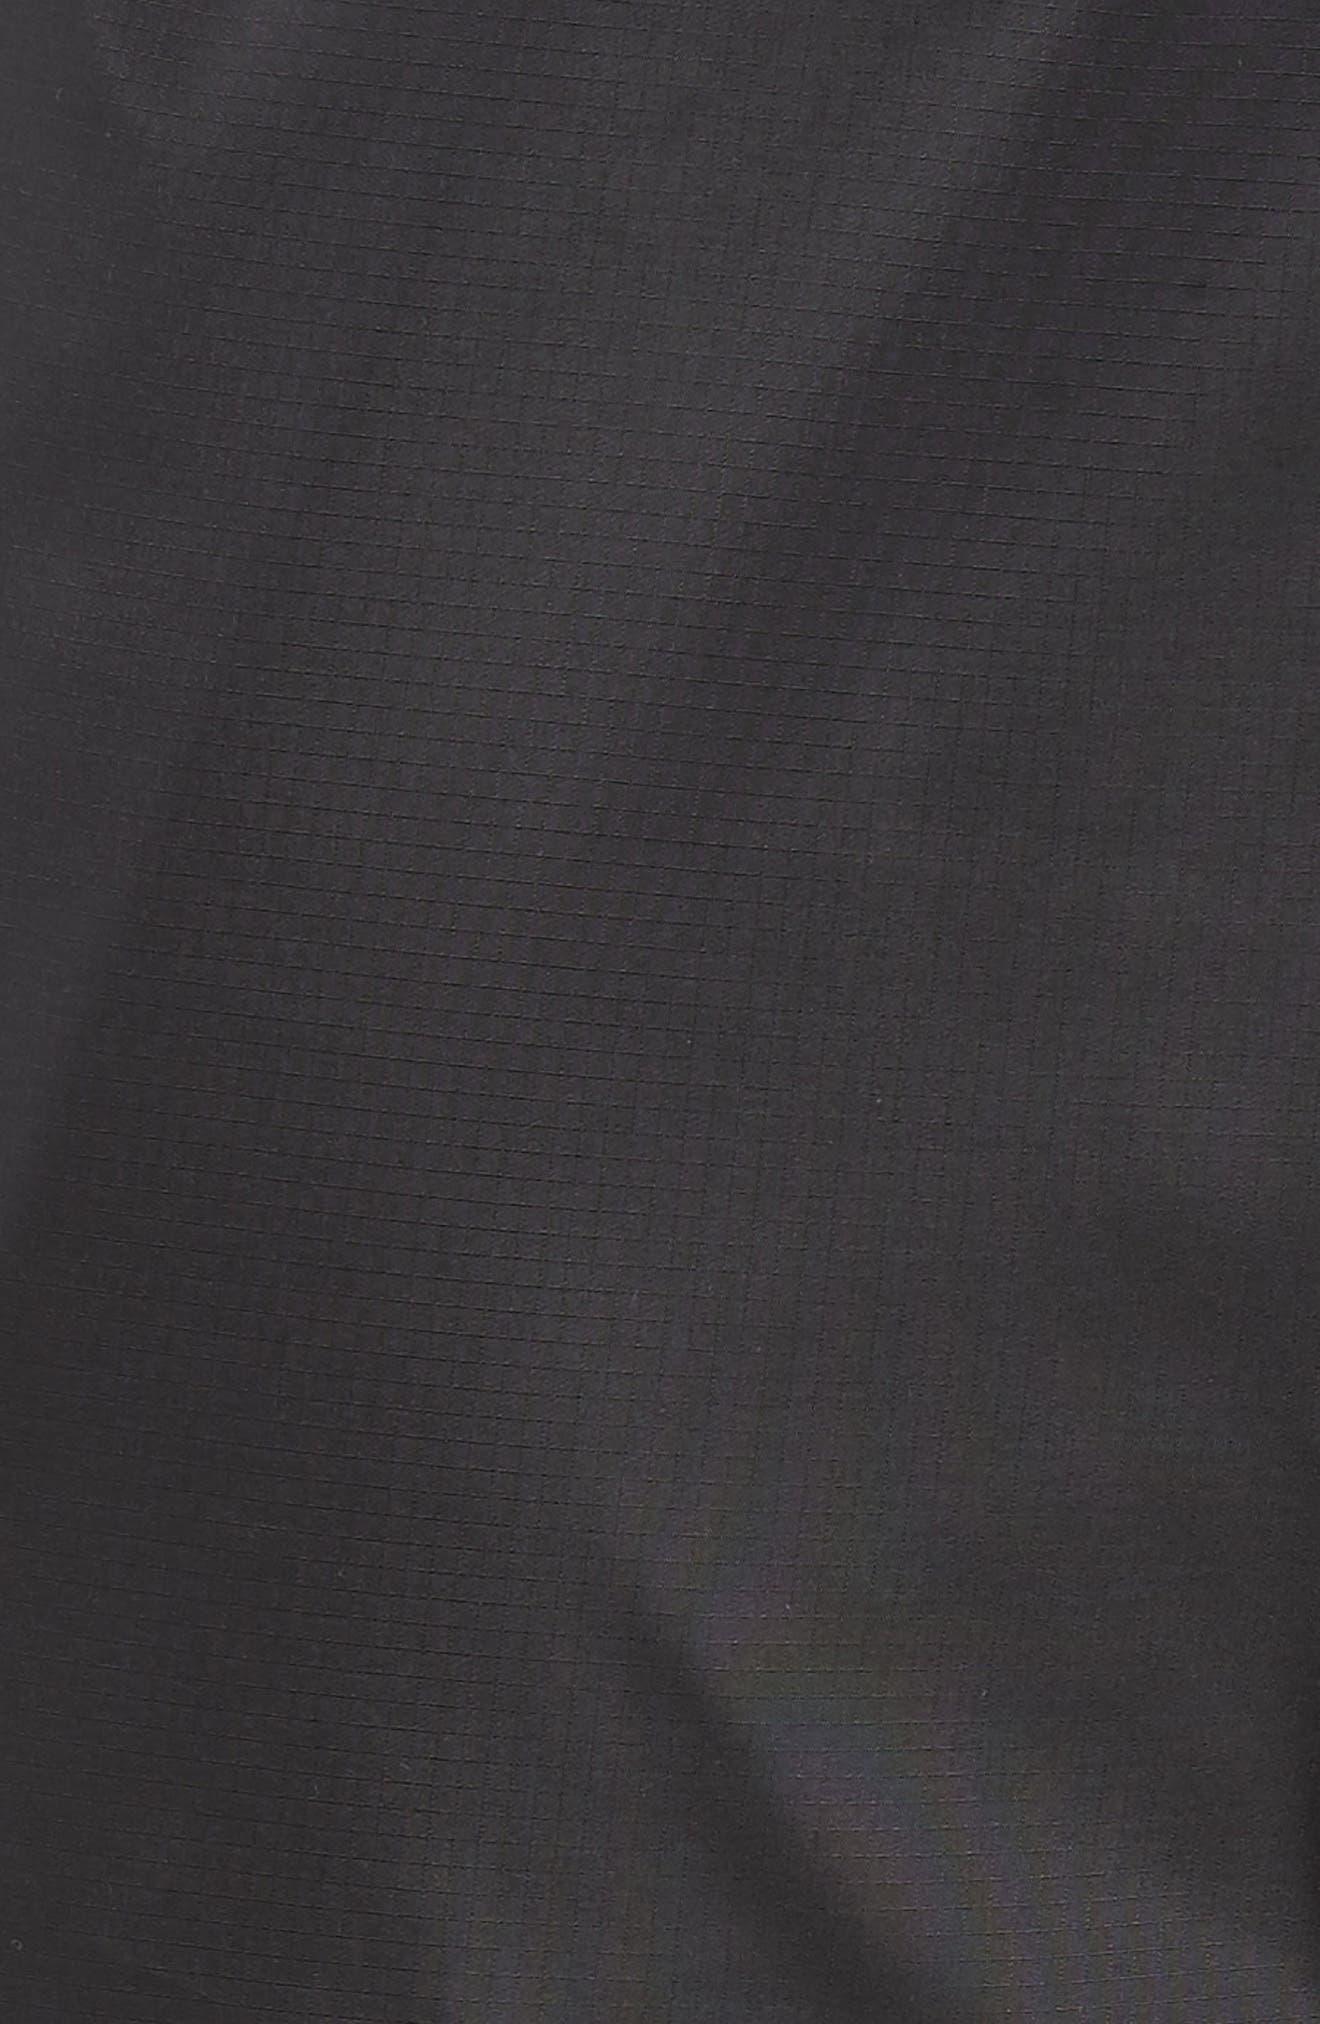 Dry Division Tech Running Pants,                             Alternate thumbnail 5, color,                             BLACK/ BLACK